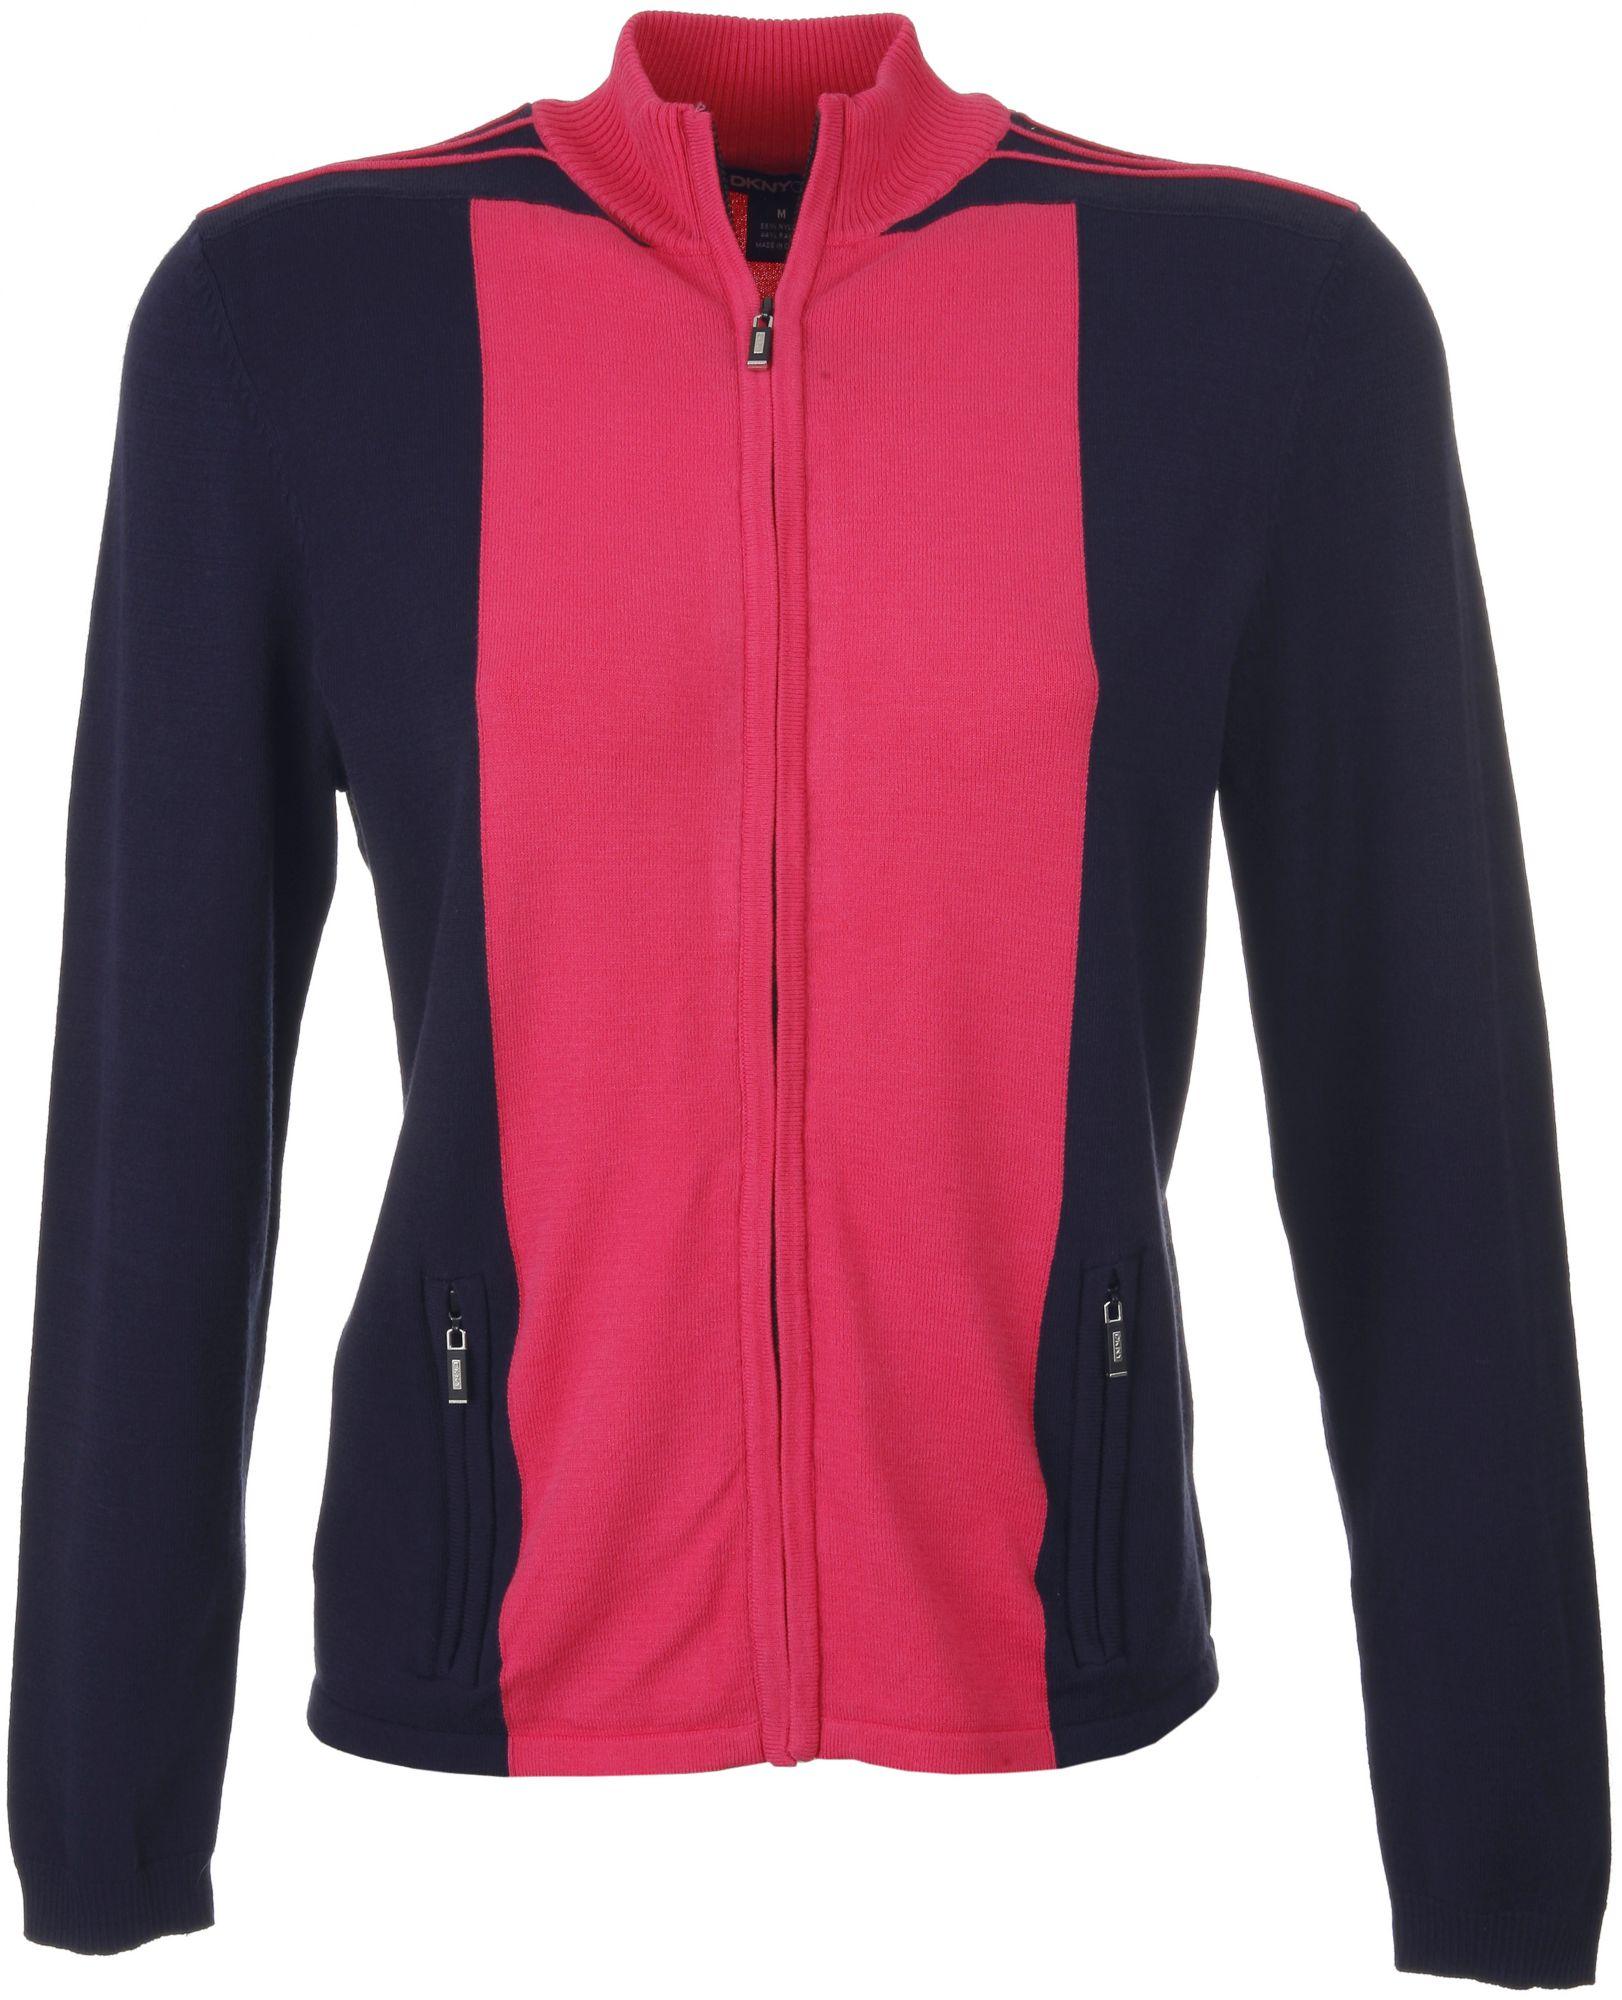 DKNY Women's Vivid and Twilight Full Zip Long Sleeve Sweater